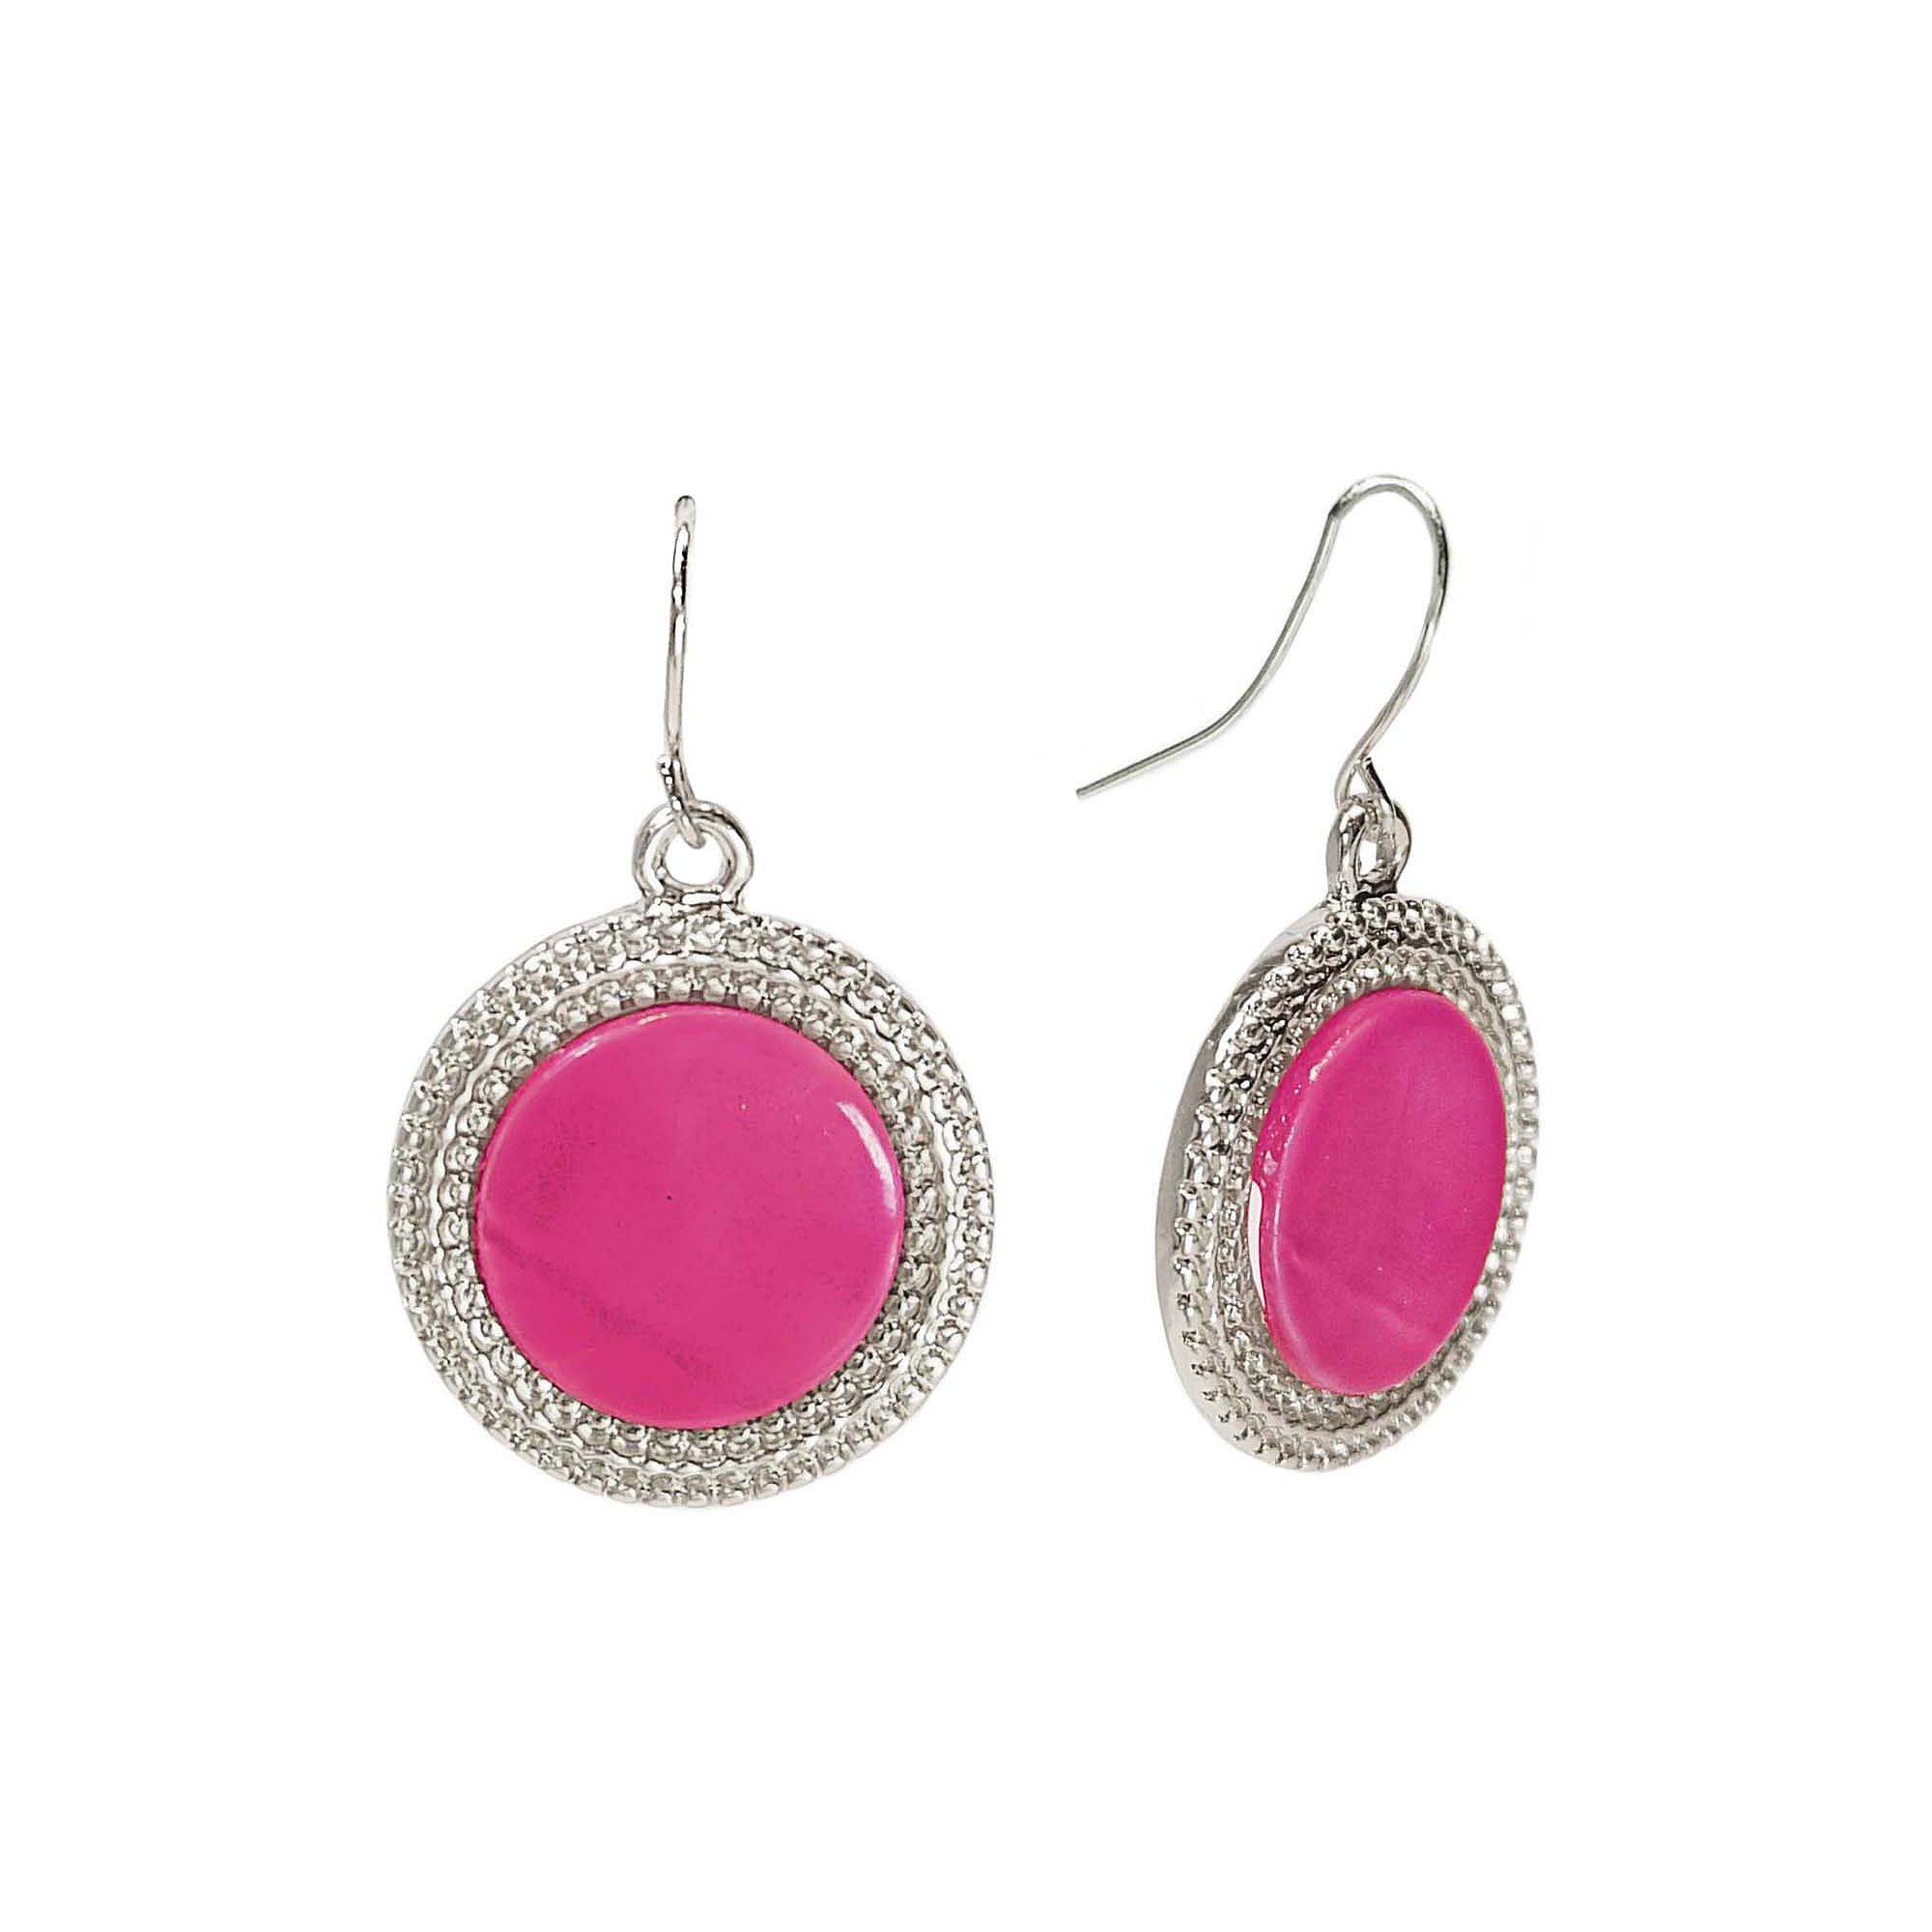 Studio by Carol Dauplaise Pink Shell Drop Earrings